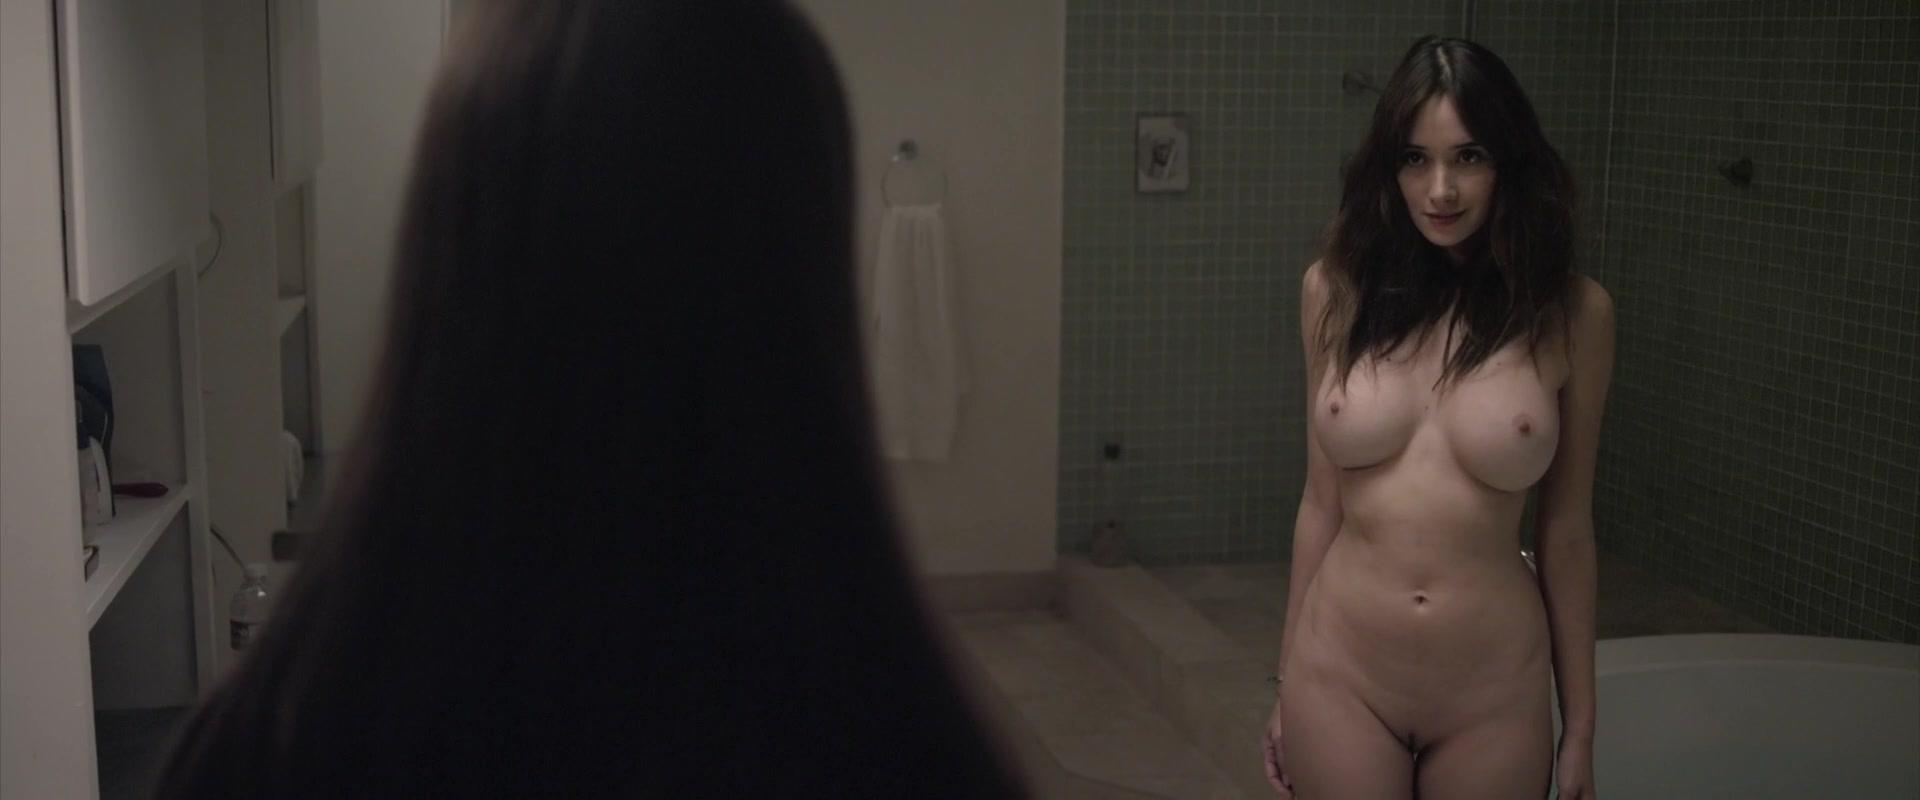 Korean nude model photo